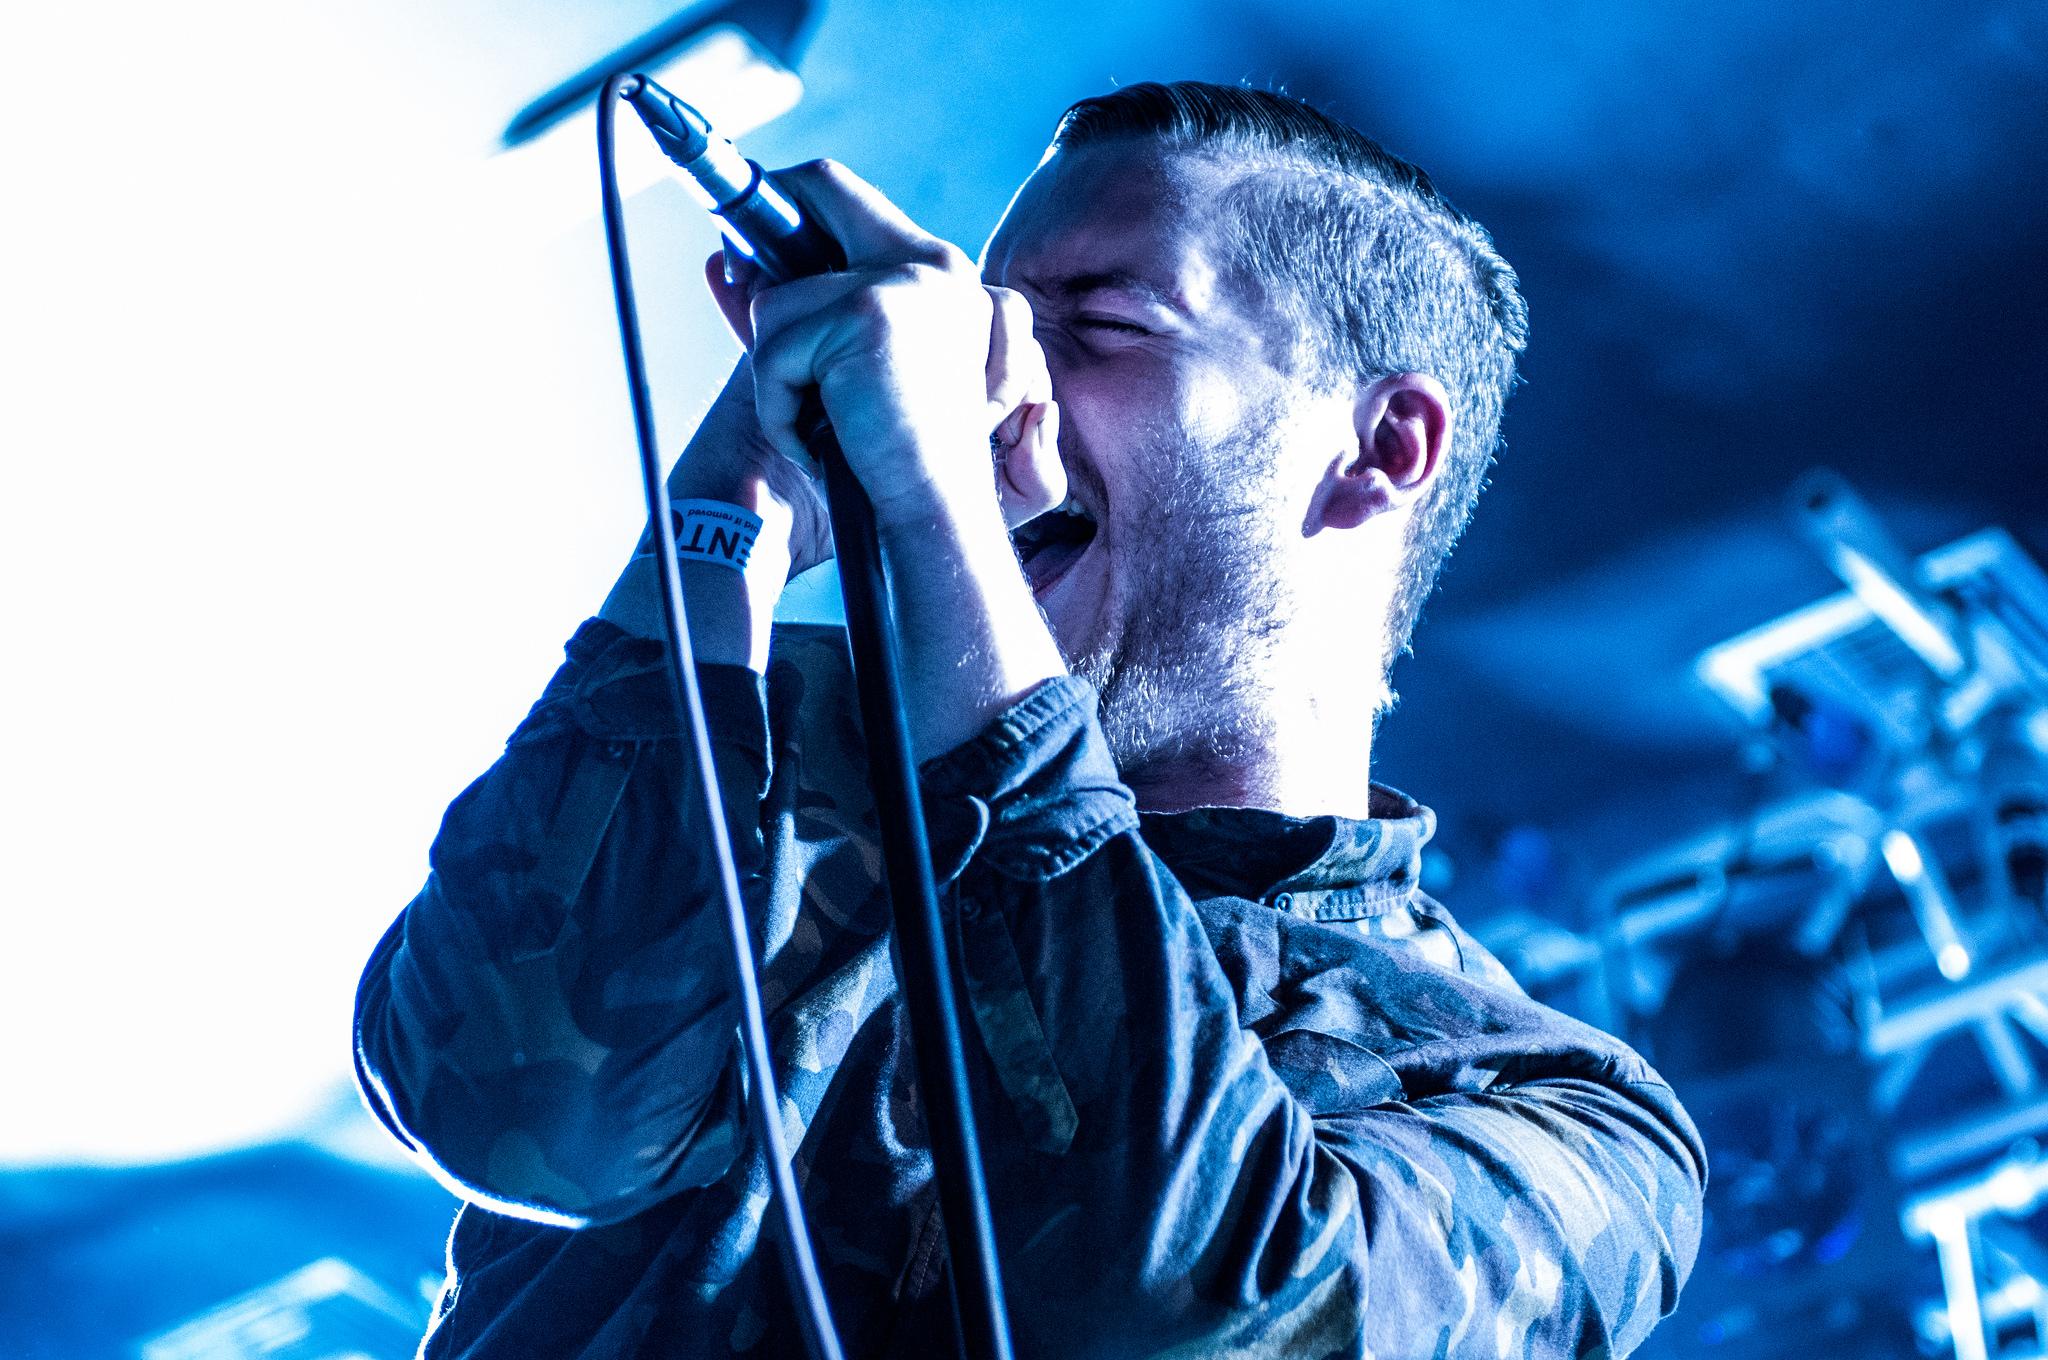 George Clarke of San Francisco-based blackgaze band Deafheaven performs on Aug. 17, 2015. (Jr Hunter/Flickr)